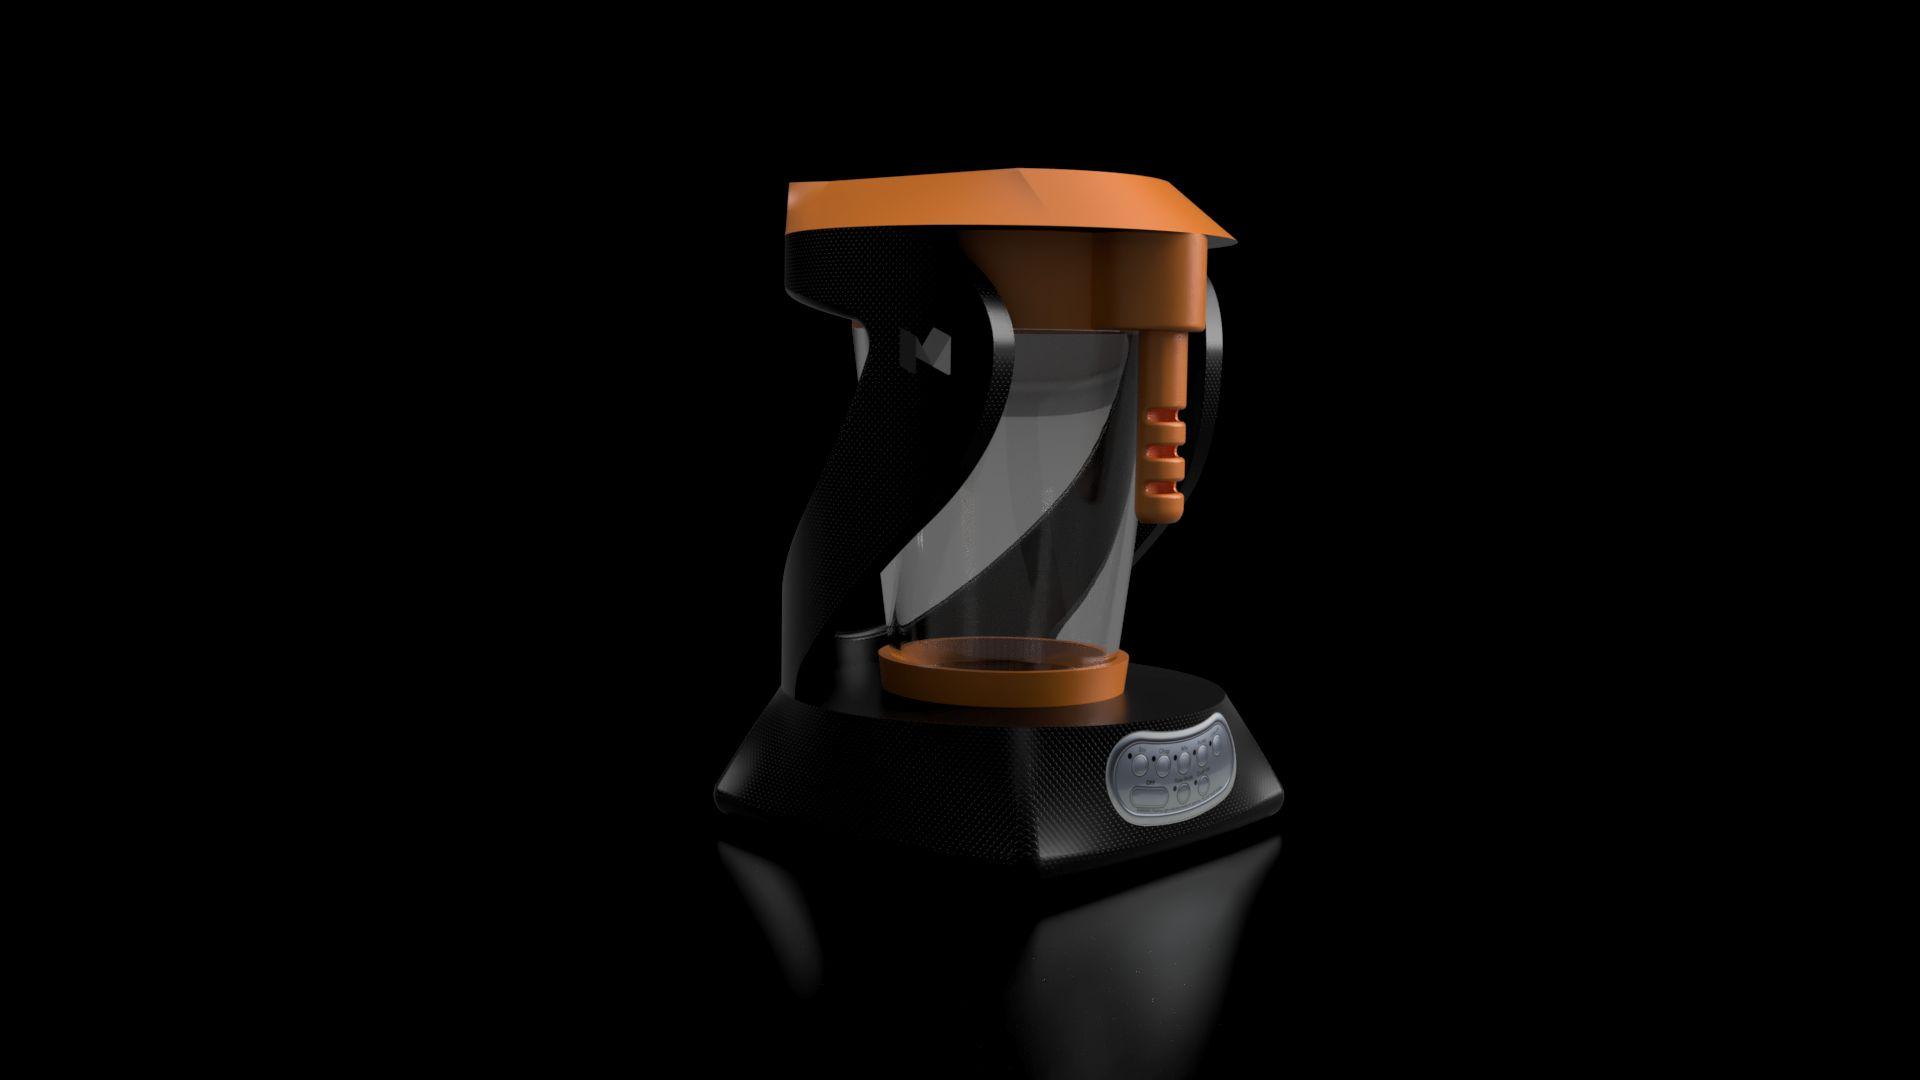 Liq-design-lcs2018-fabrica-de-nerdes-1-3500-3500